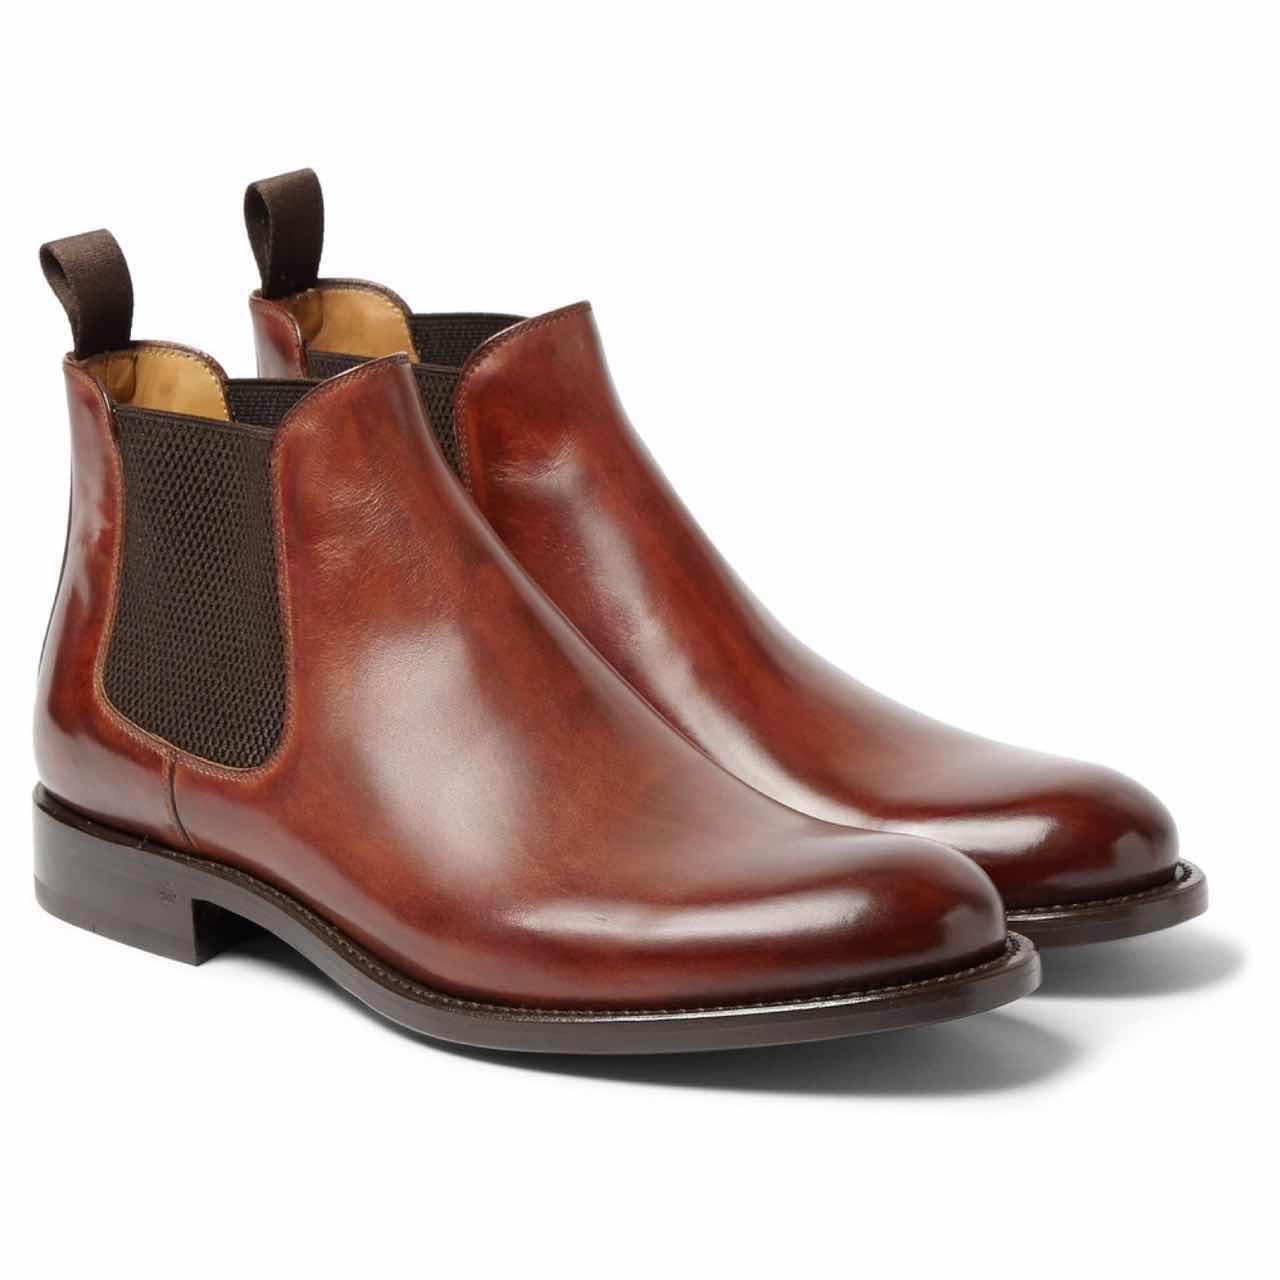 棕色牛仔靴